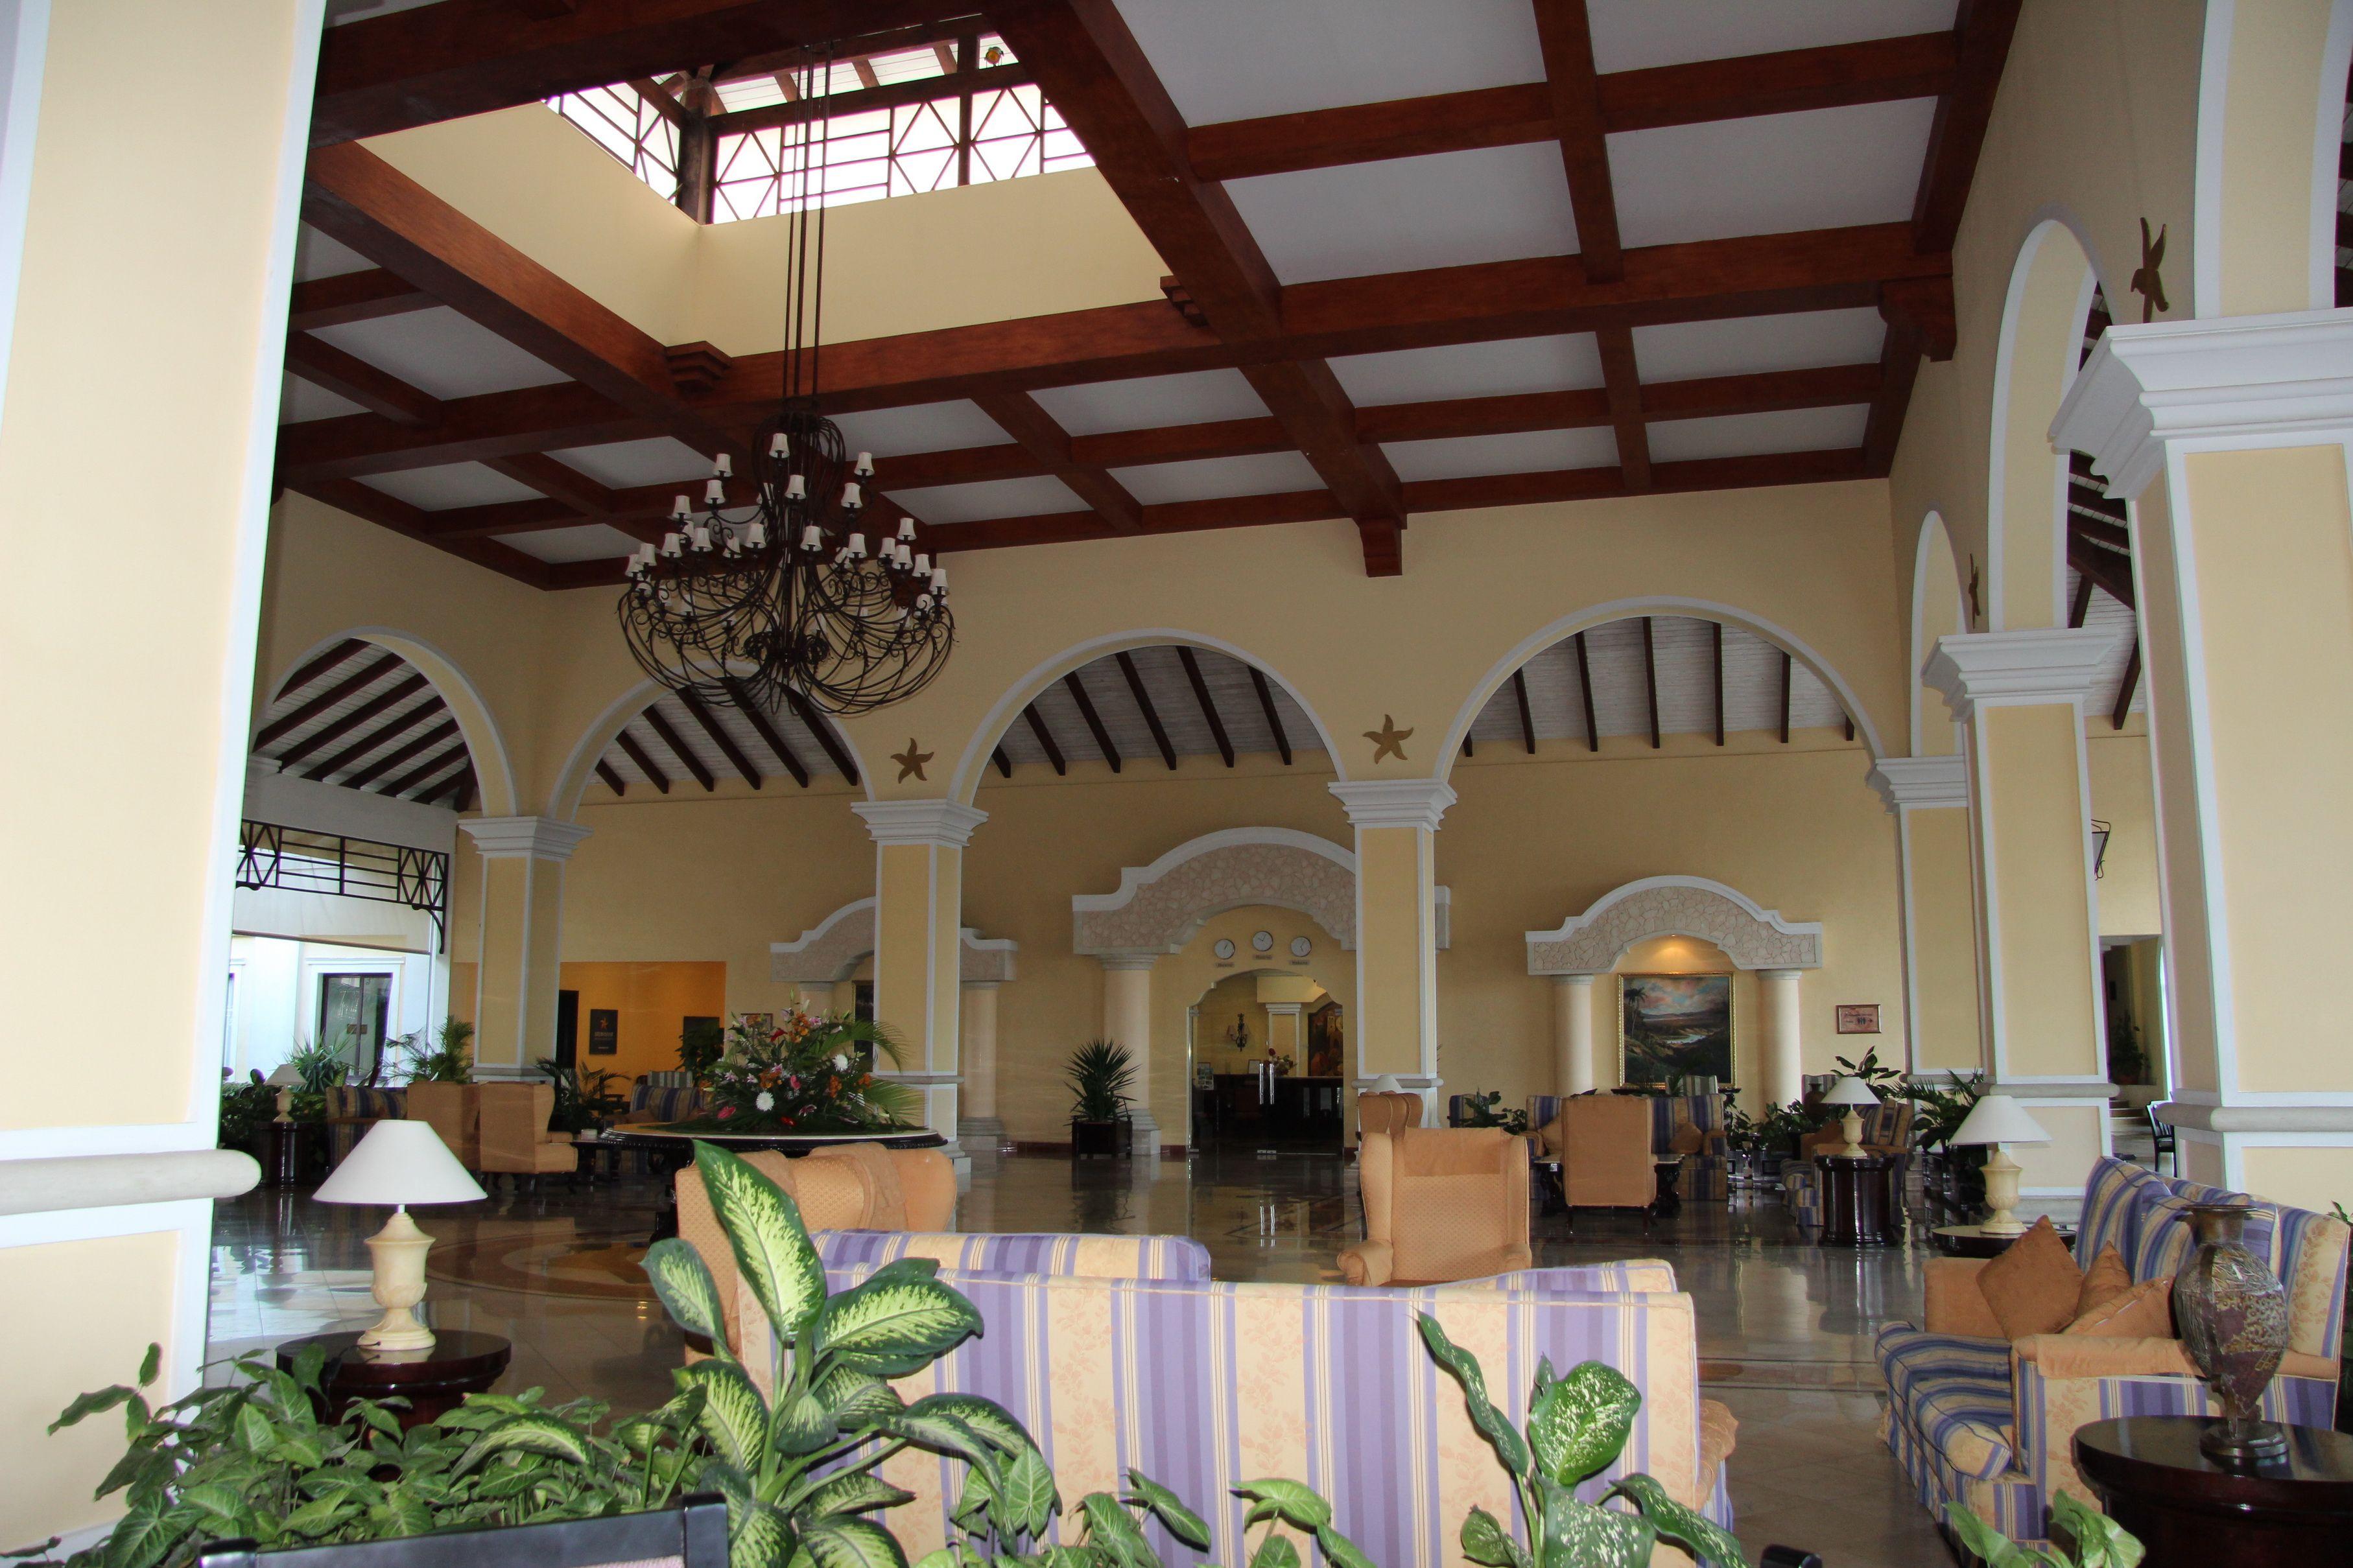 Royal Hideaway Ensenachos, now Iberostar Ensenachos, my first Cuba experience Cuba, Cayo Santa Maria